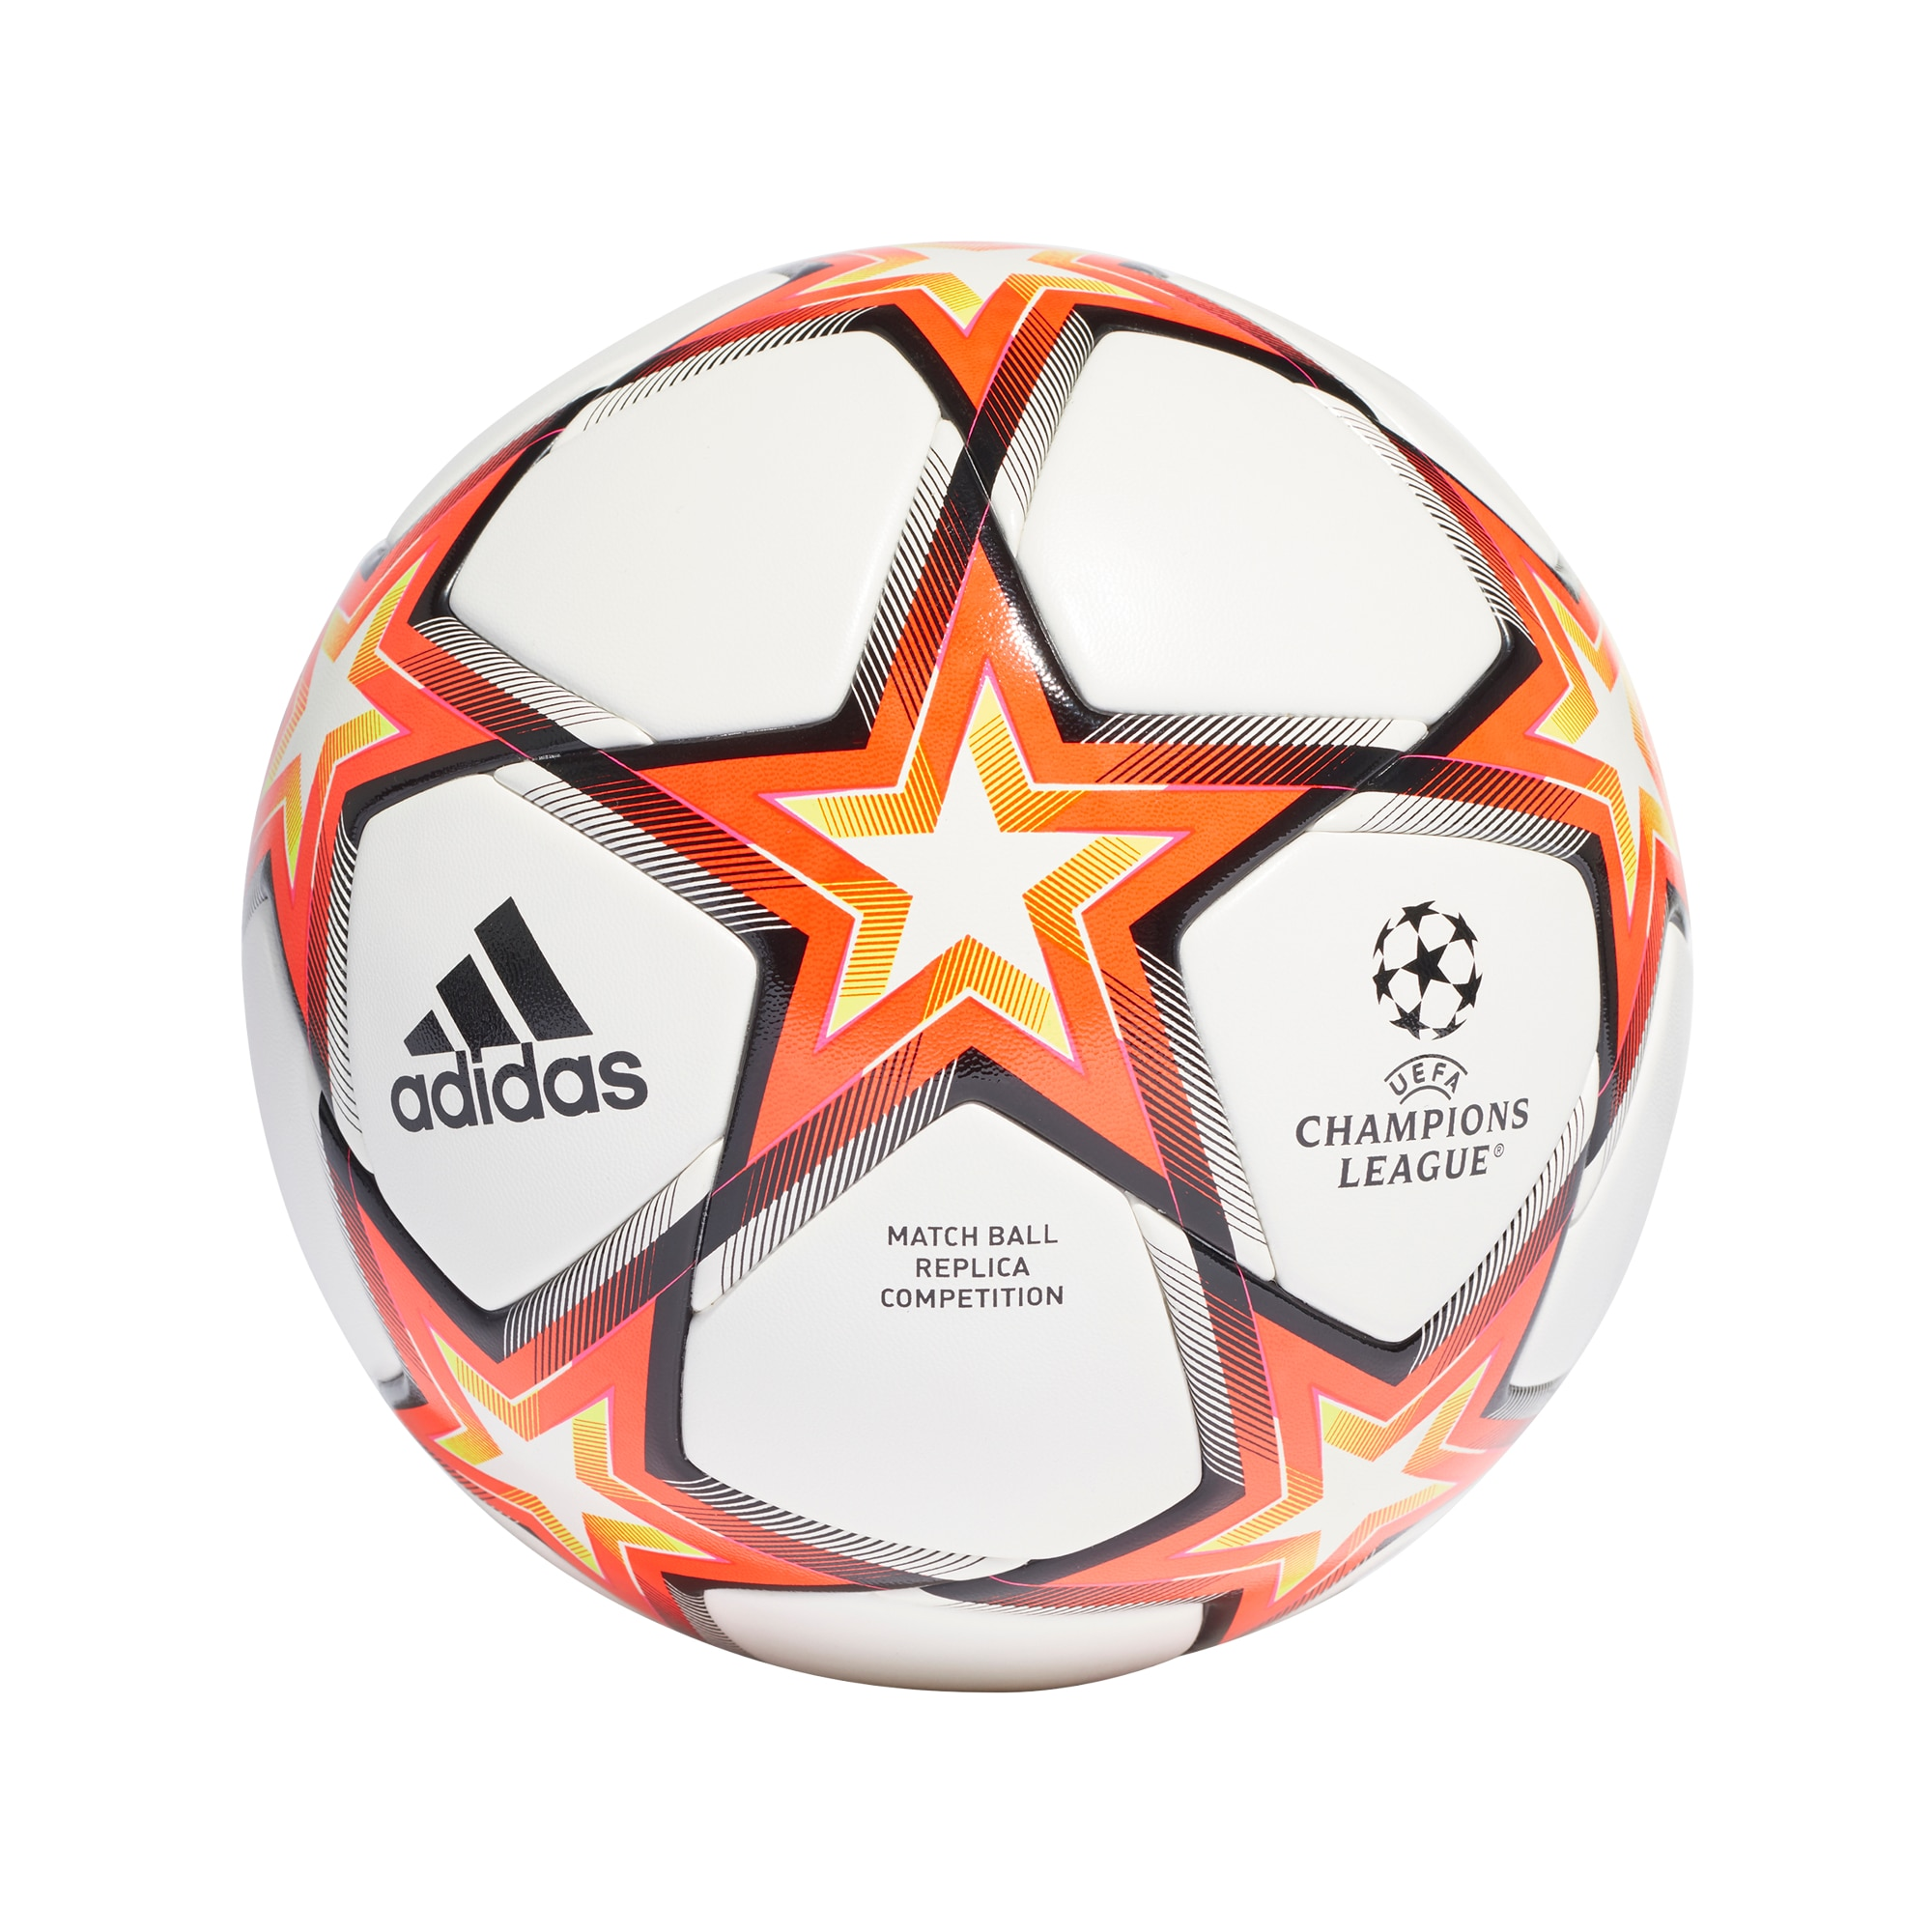 Adidas Champions League Competition Fotball 21/22